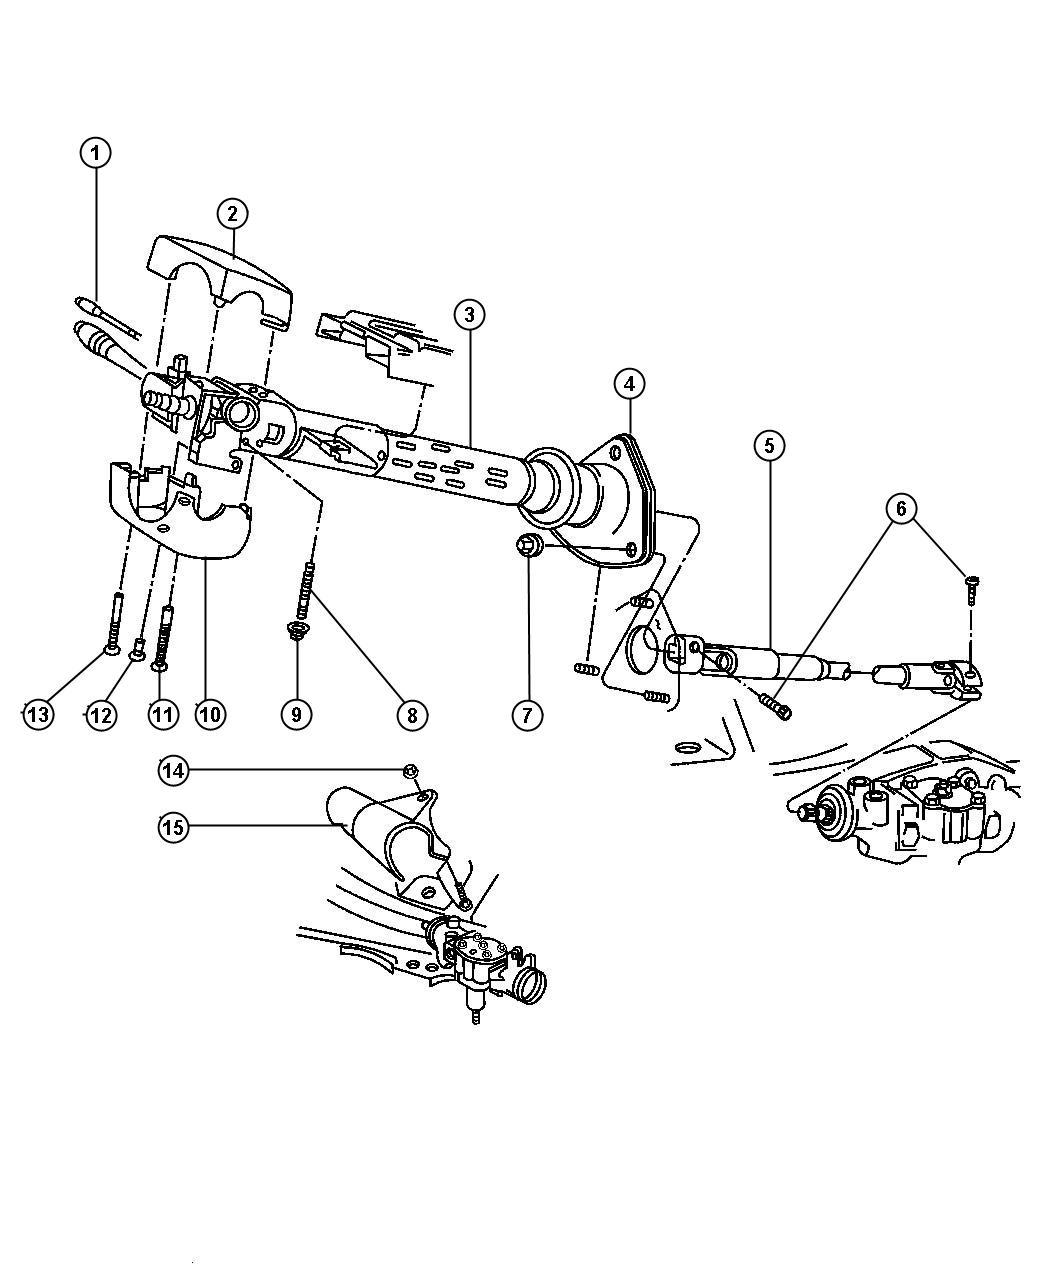 Jeep Grand Cherokee Screw Mounting Filister Head 8 16x